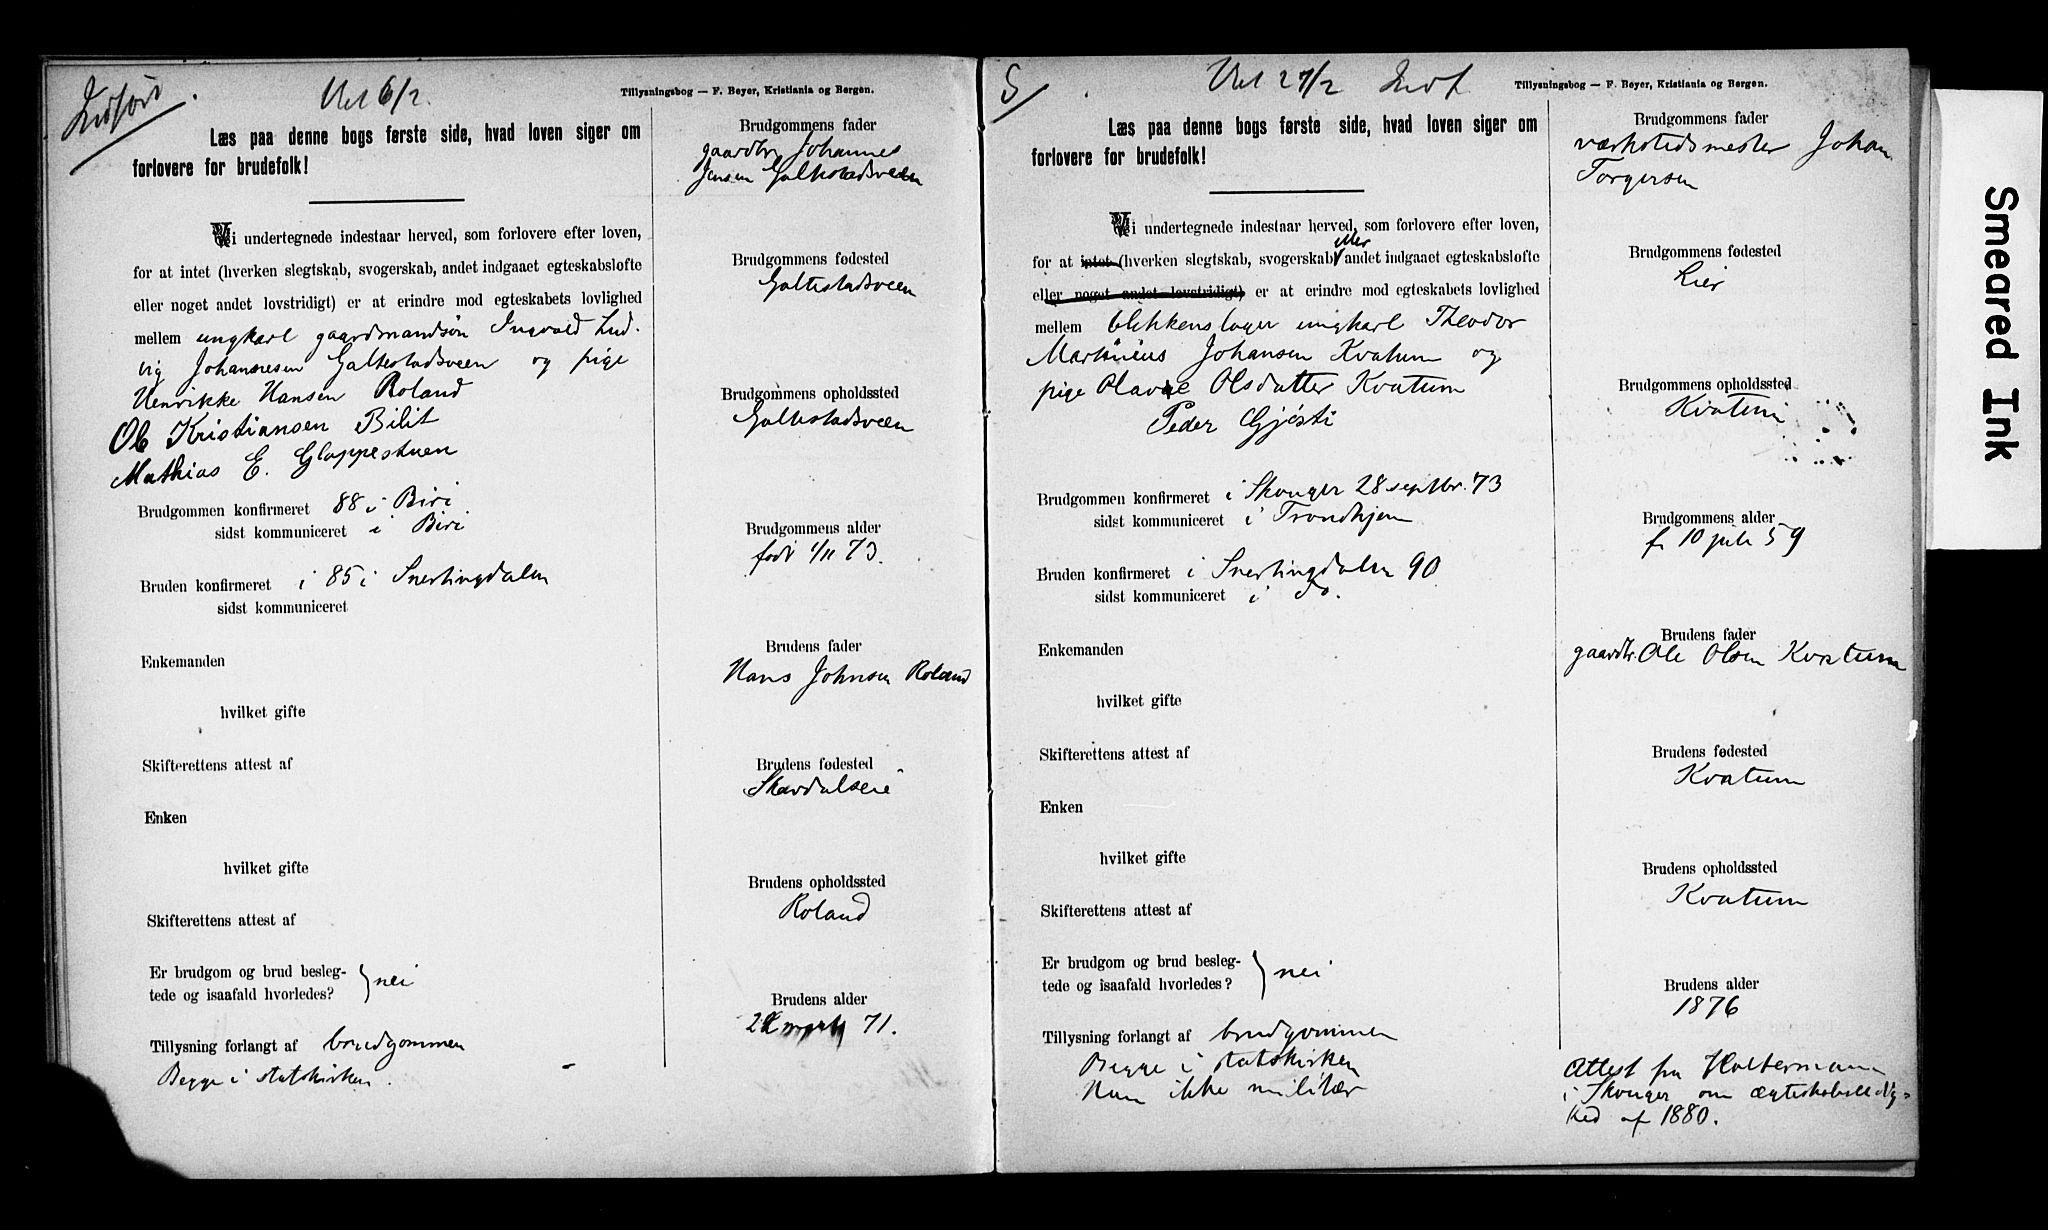 SAH, Biri prestekontor, I/Ie/Iea/L0001/0001: Lysningsprotokoll nr. 1.1, 1892-1896